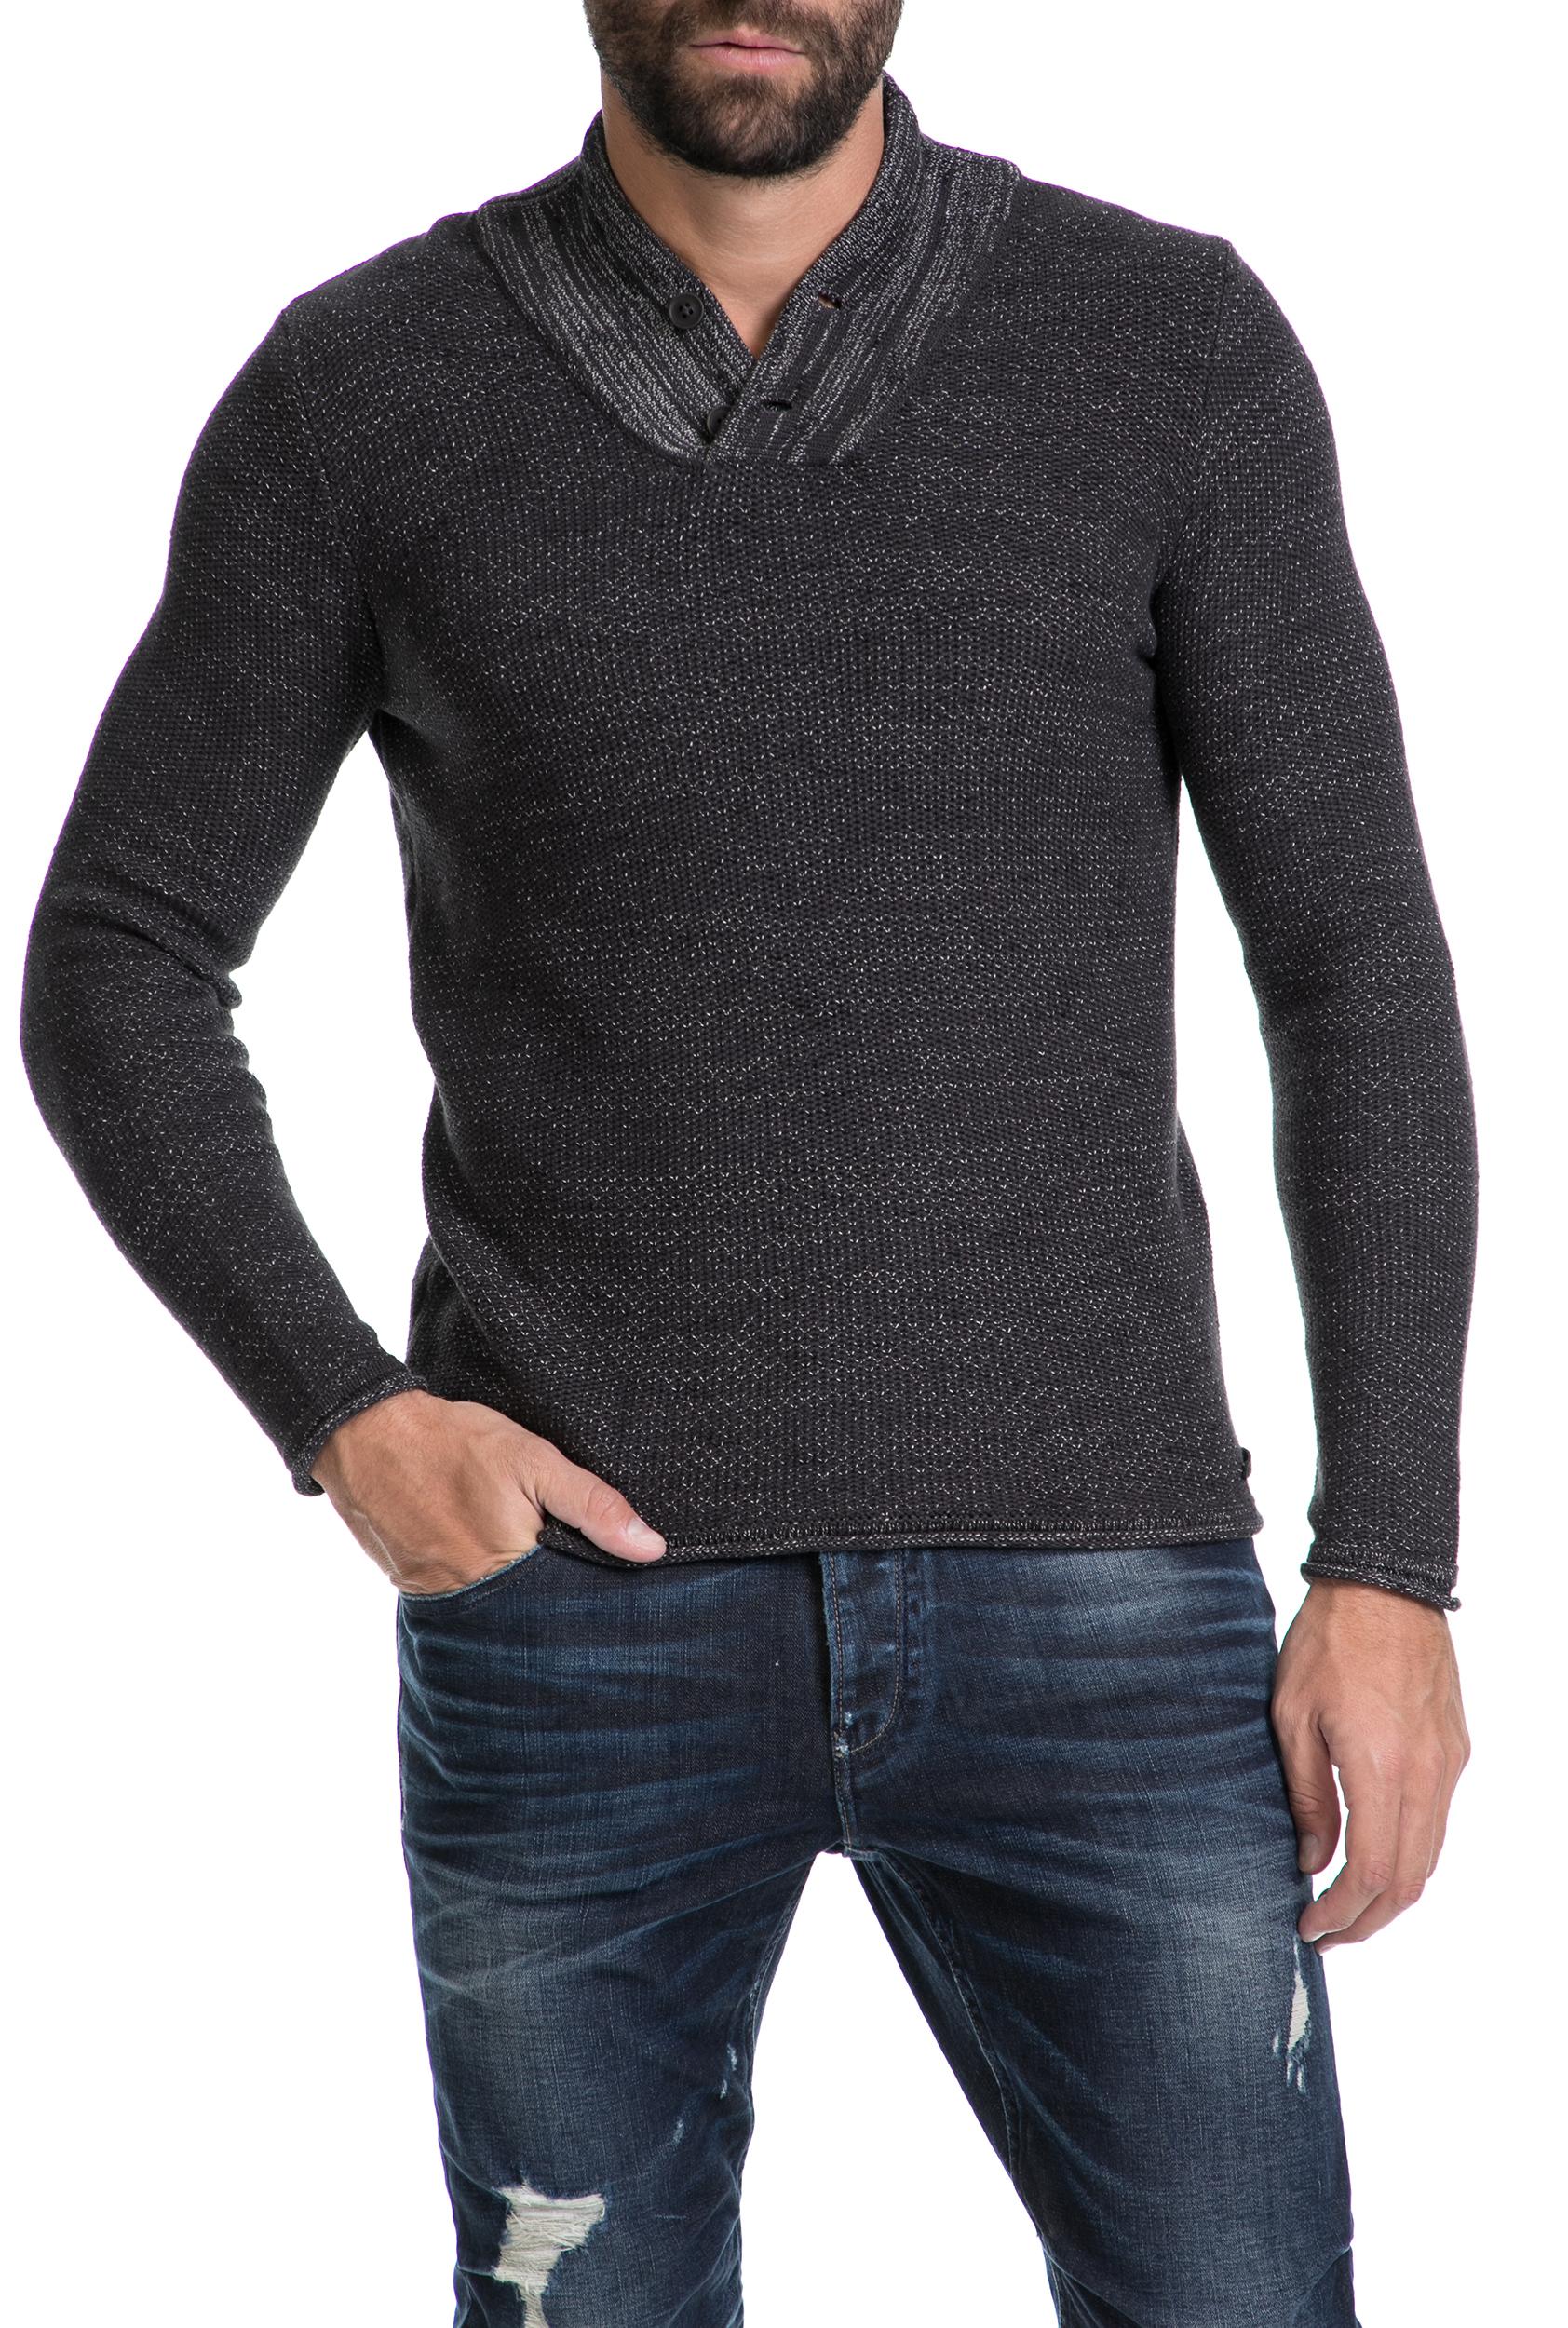 GARCIA JEANS - Ανδρικό πουλόβερ GARCIA JEANS γκρι ανδρικά ρούχα πλεκτά ζακέτες μπλούζες